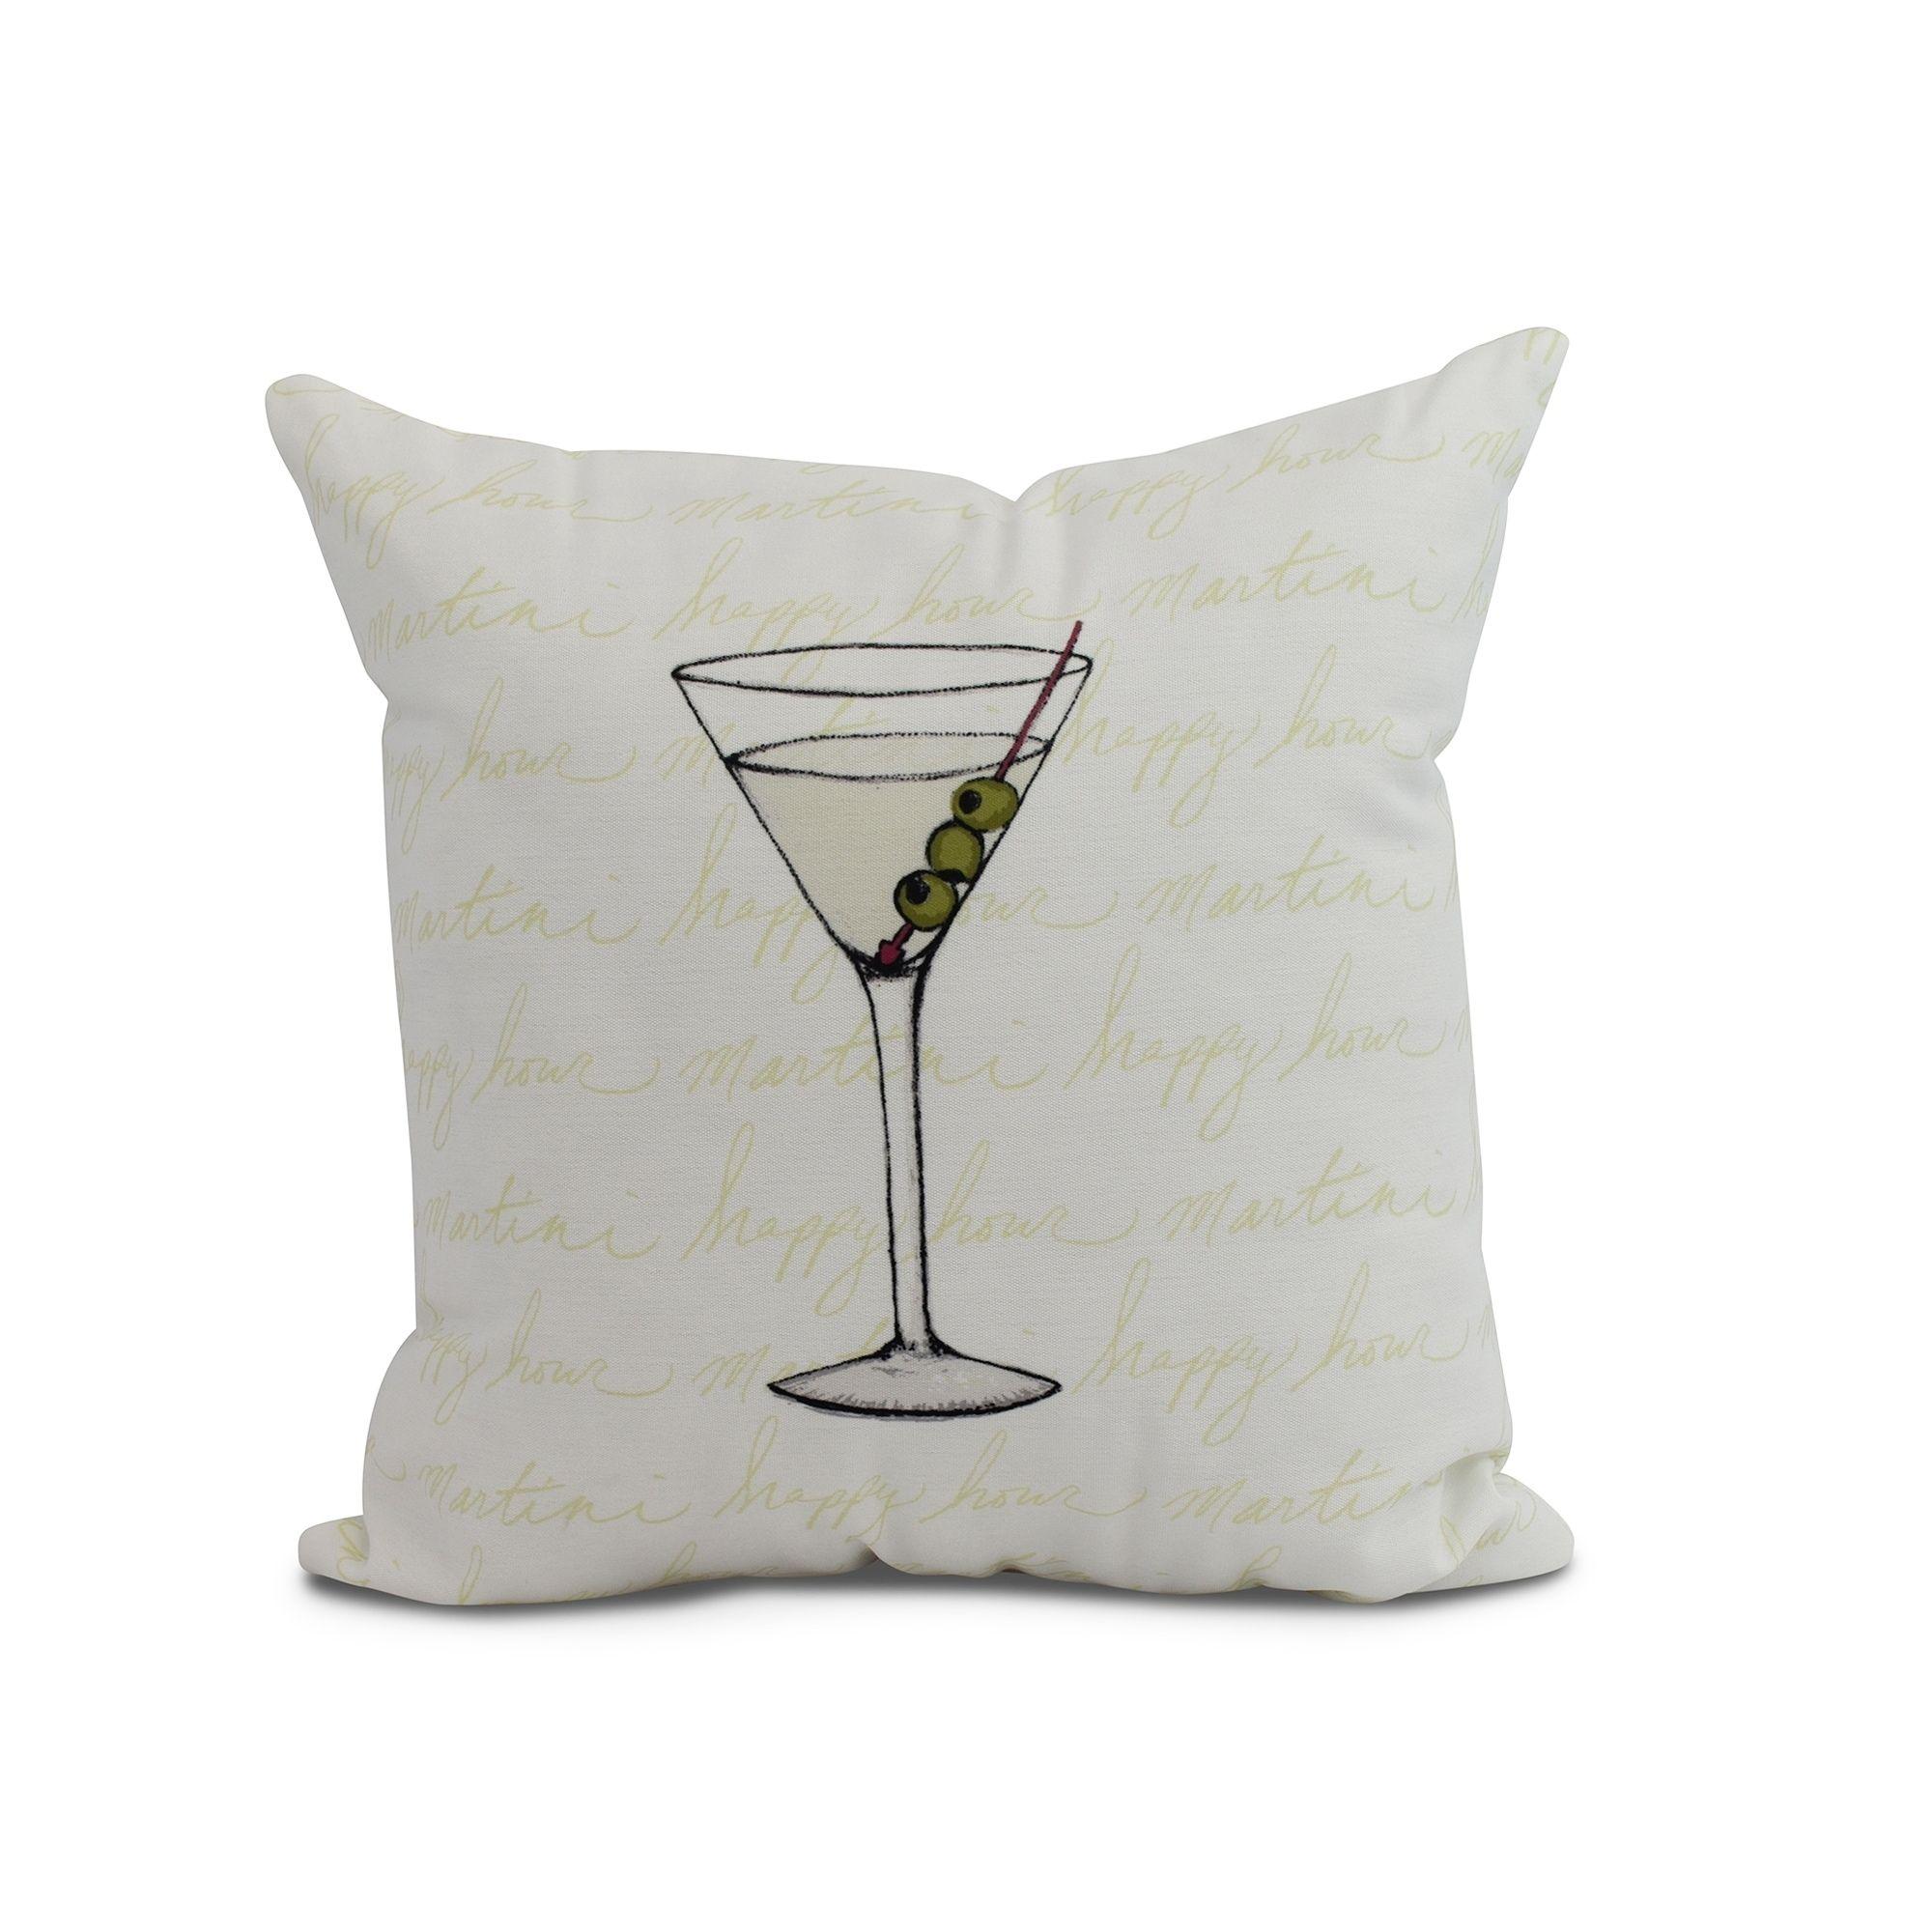 x inch martini glass text fade geometric print outdoor pillow